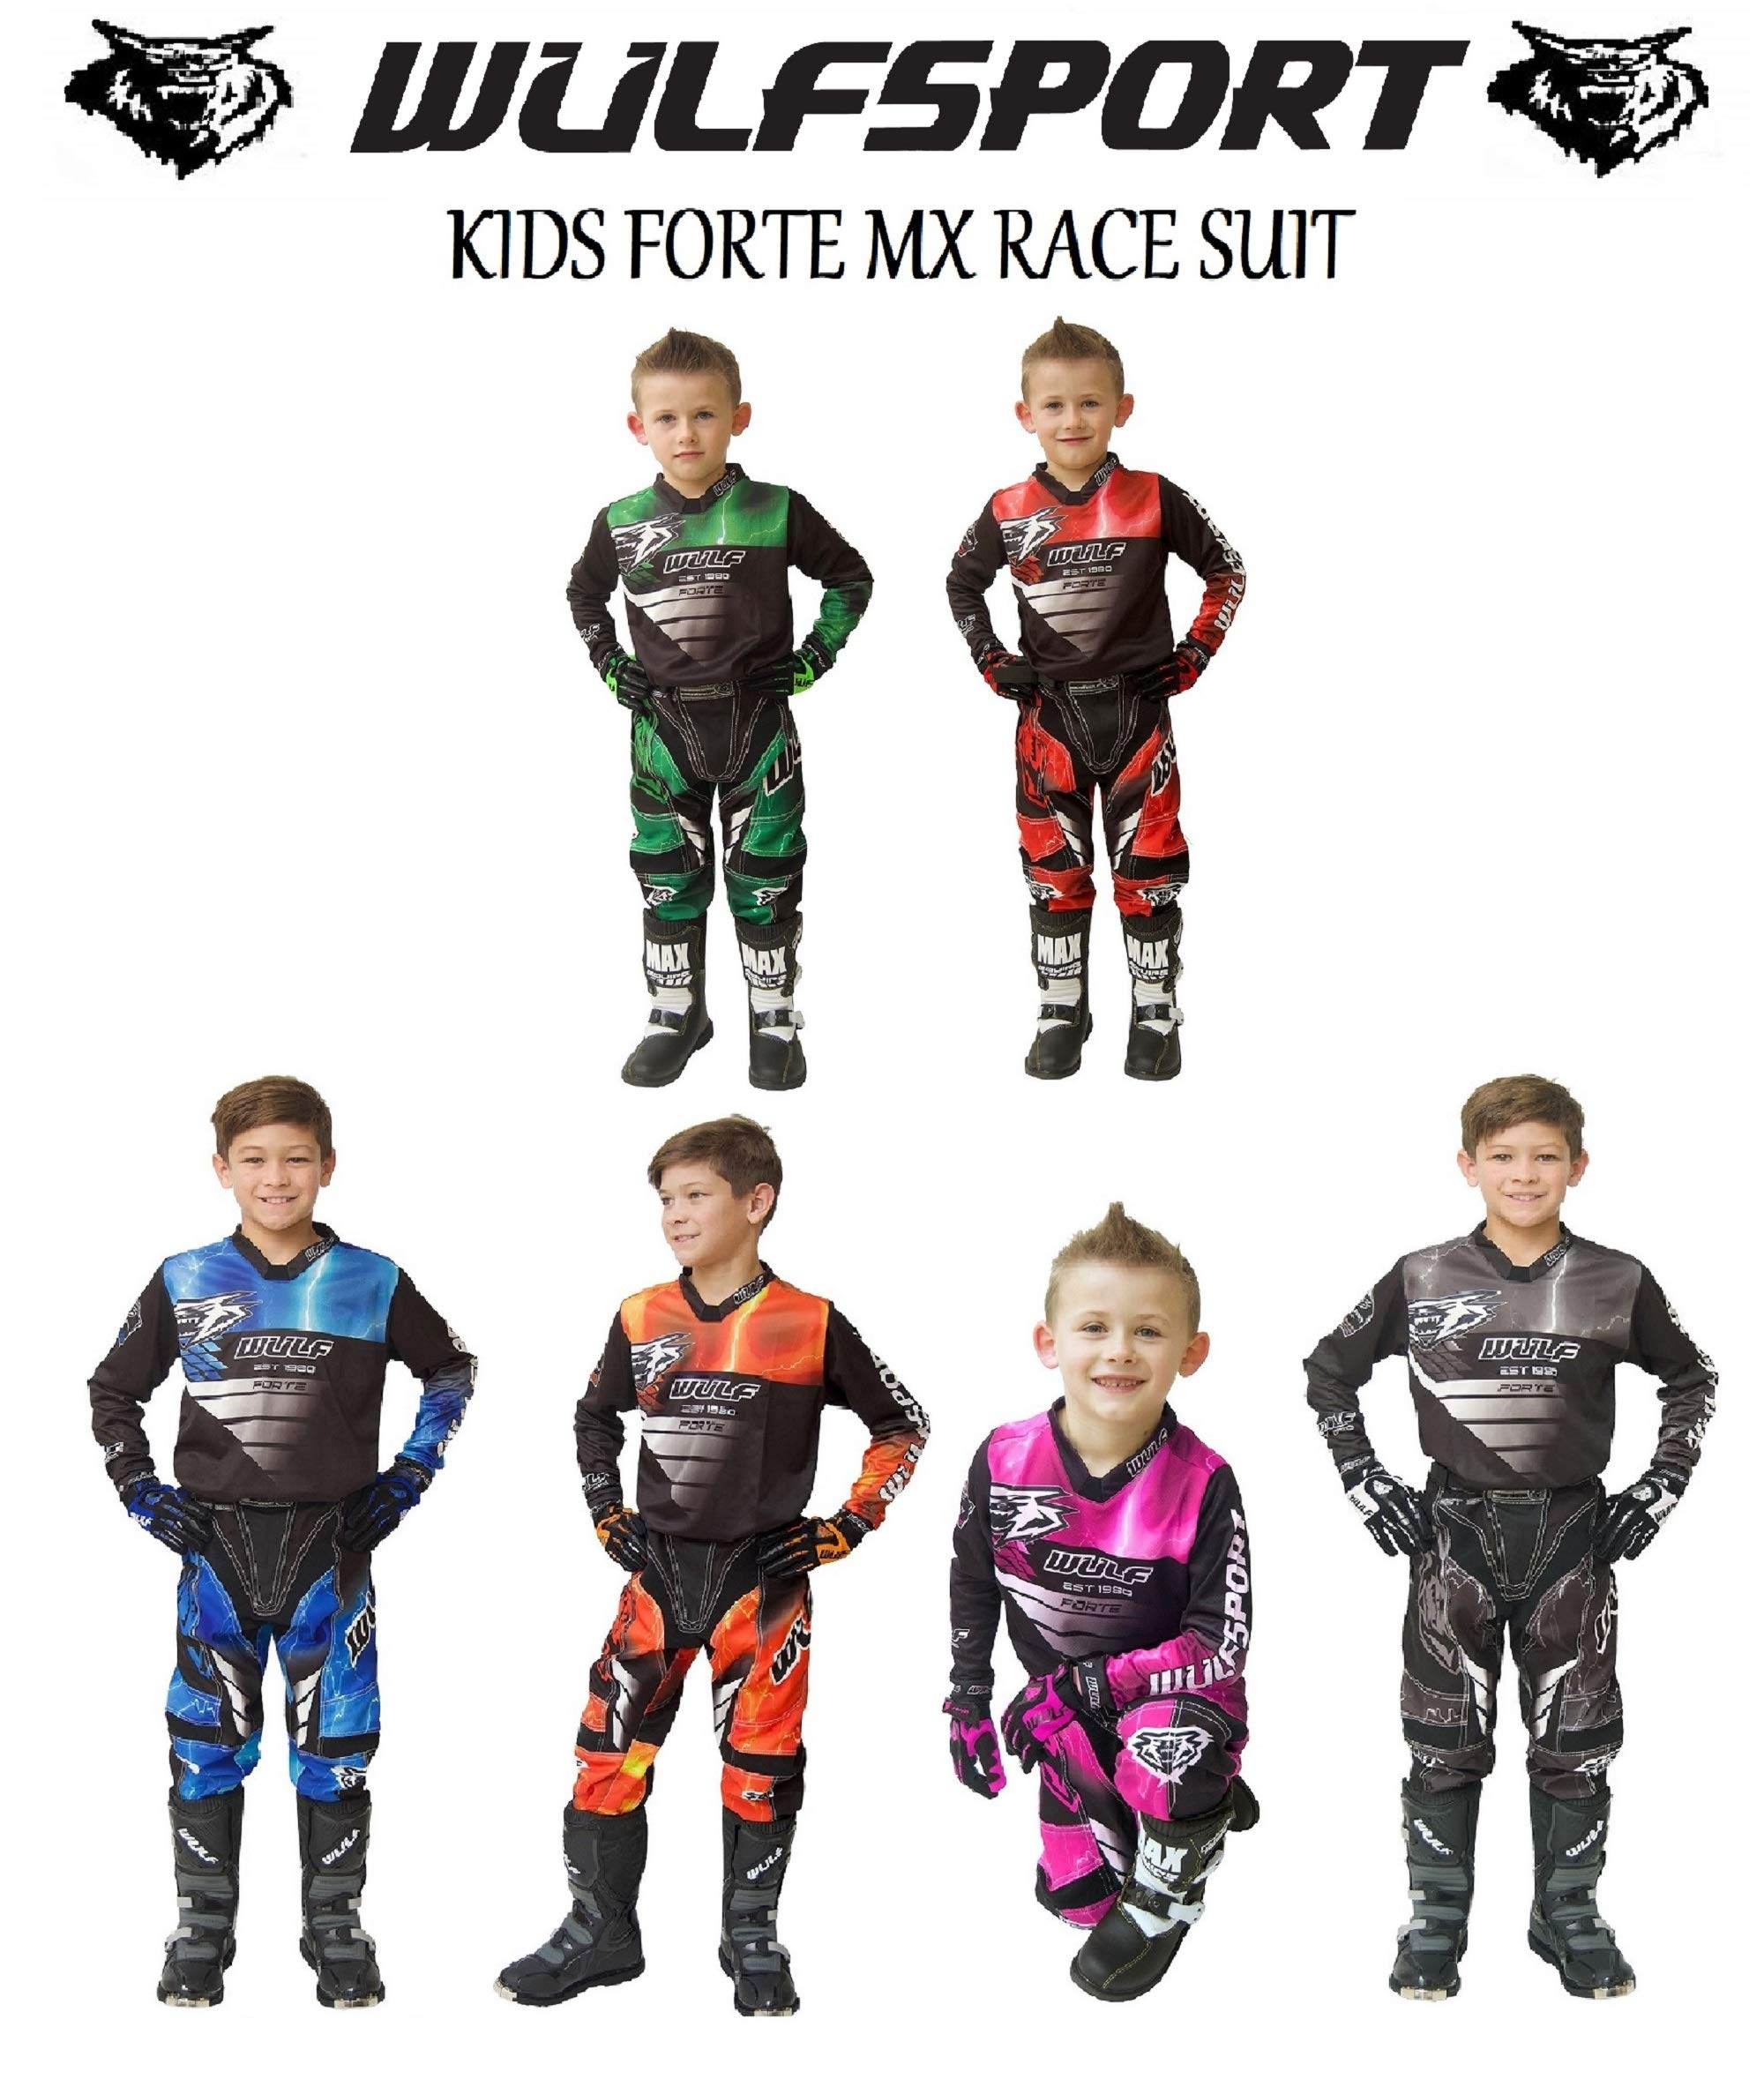 WULFSPORT FORTE MOTORBIKE KIDS RACE SUIT New 2020 Motocross Quad Enduro ATV MX Pit Sport Junior Pant Shirt Kit